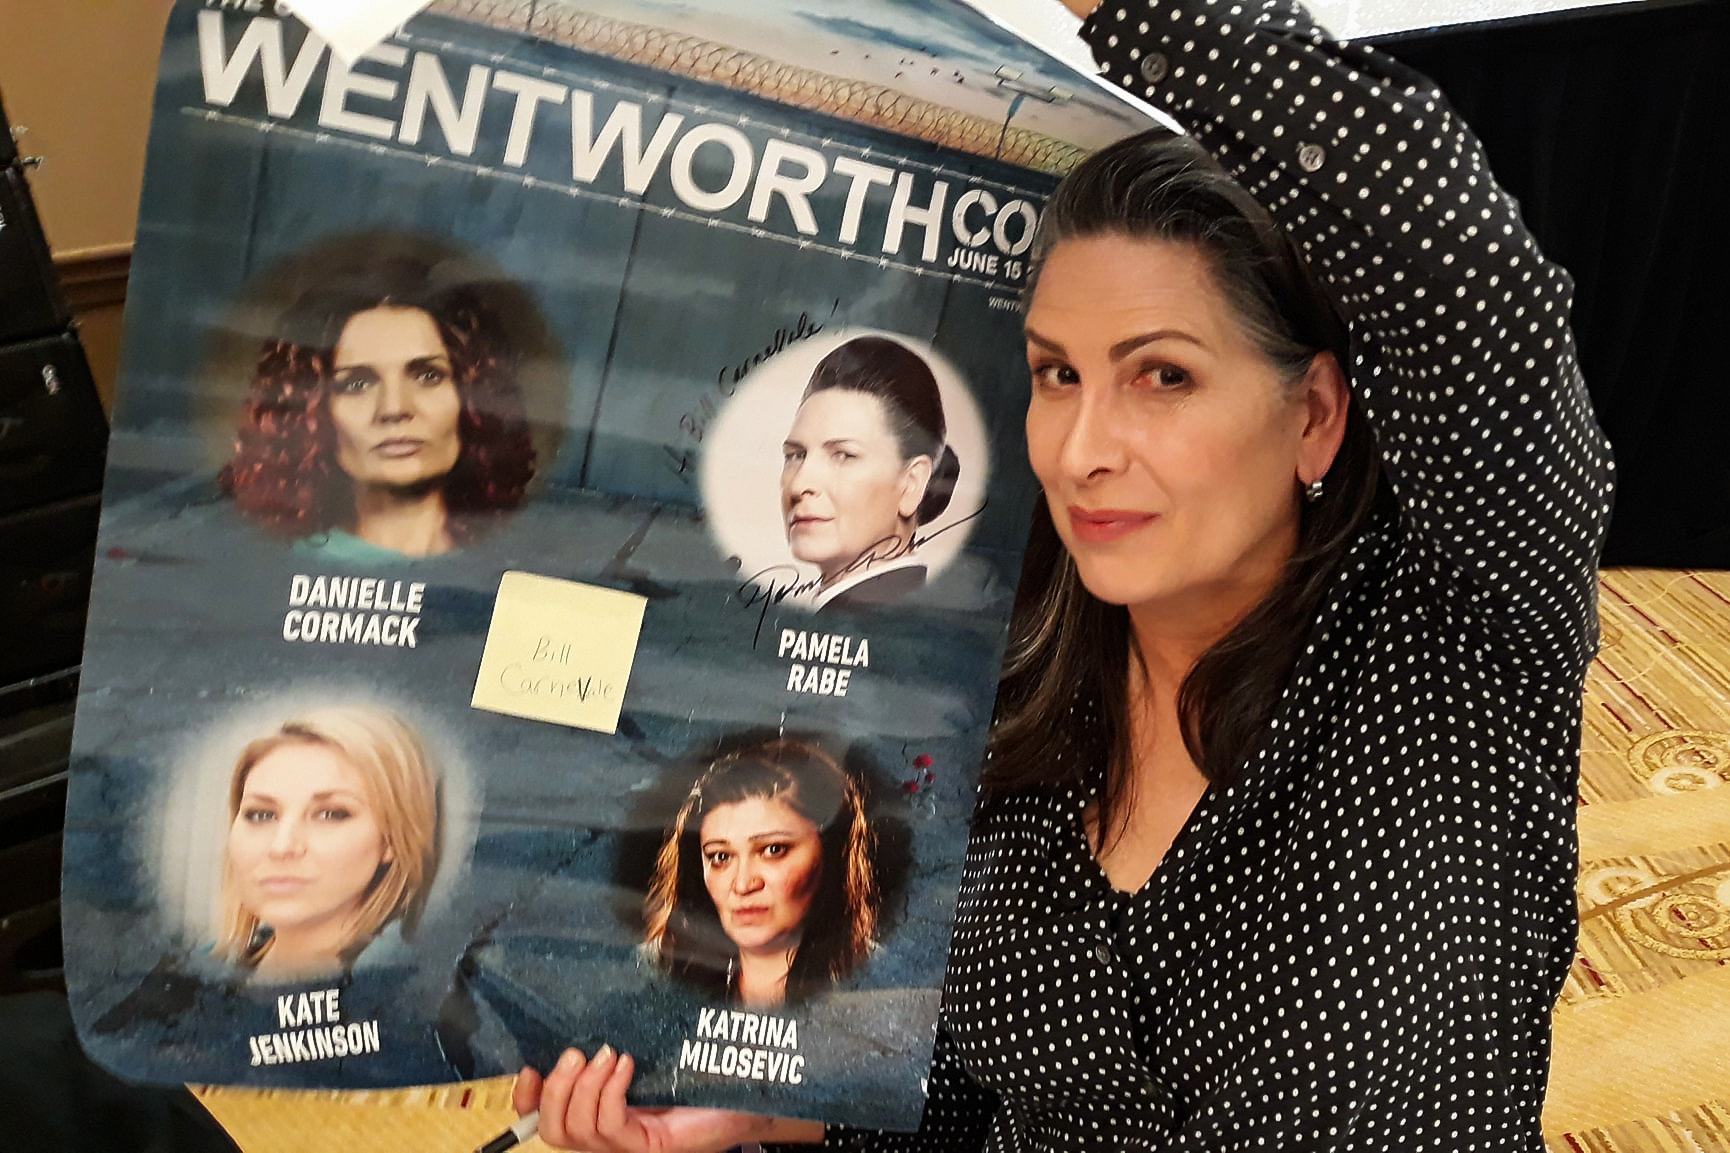 Pamela Rabe | Wentworth Con | Photo by Bill Carnavale